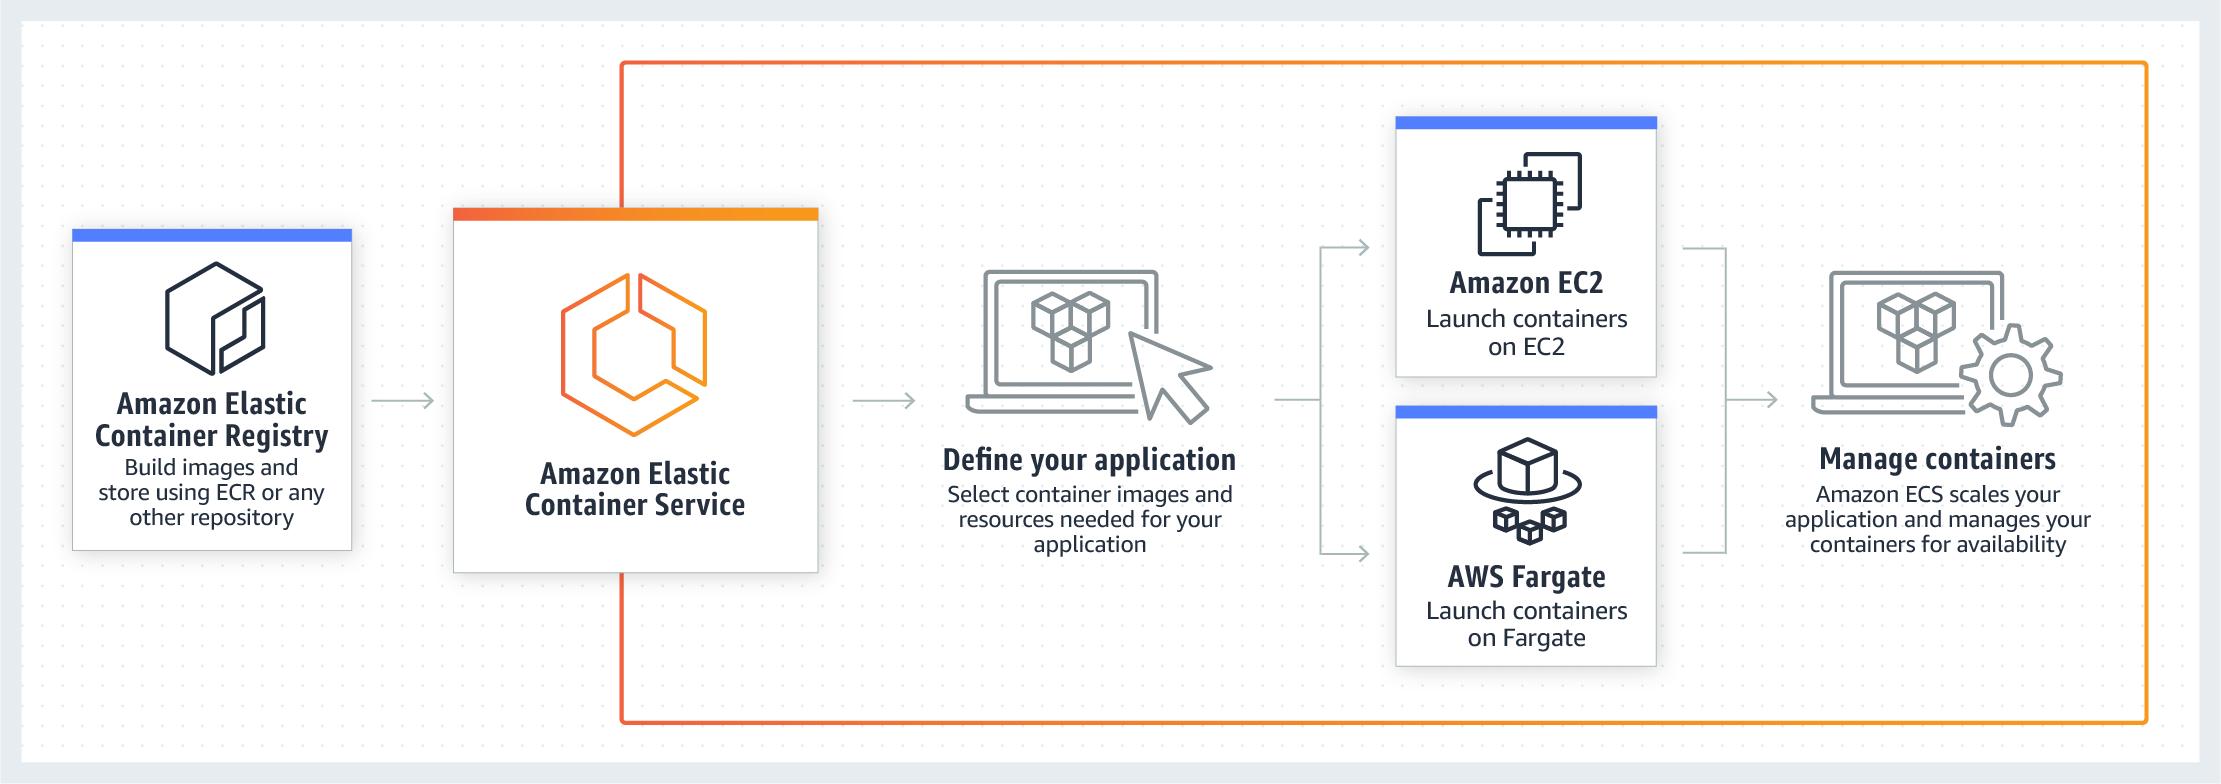 Amazon Elastic Container Service (Amazon ECS) Demo - Amazon ECS Diagram